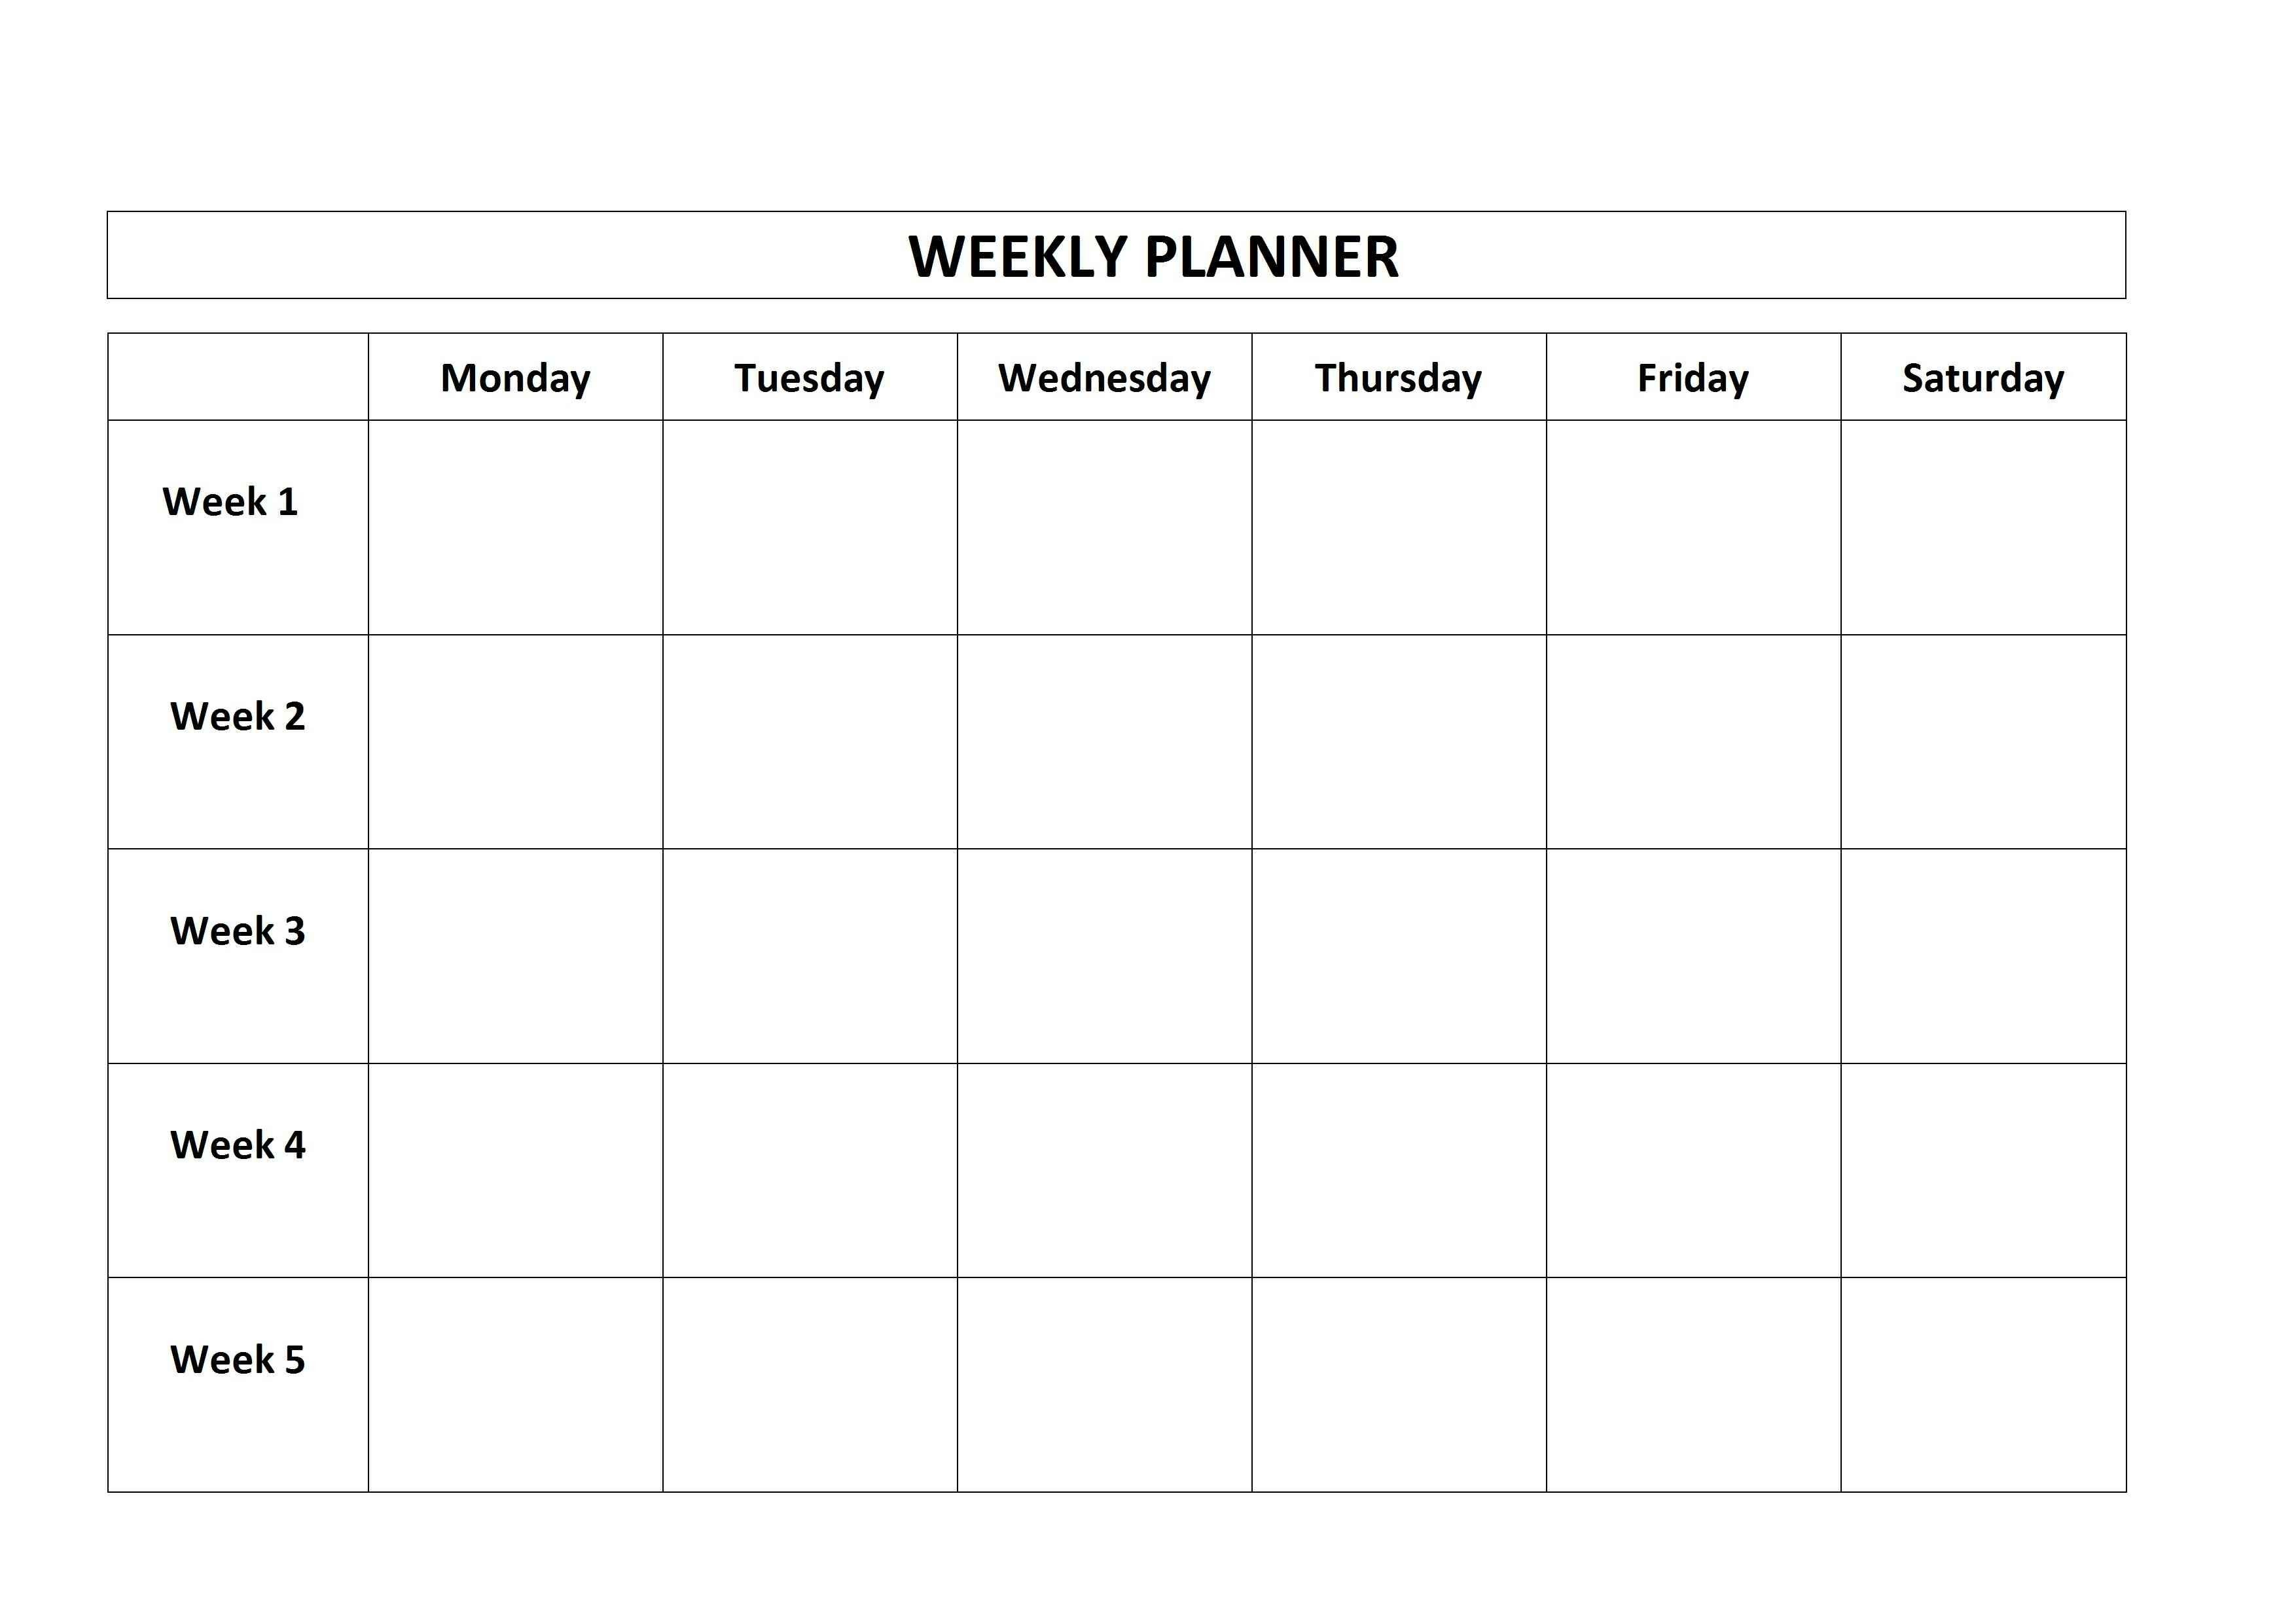 5 Day Calendar Template  Vaydile.euforic.coblank Calendar with Printable 5 Day Calendar